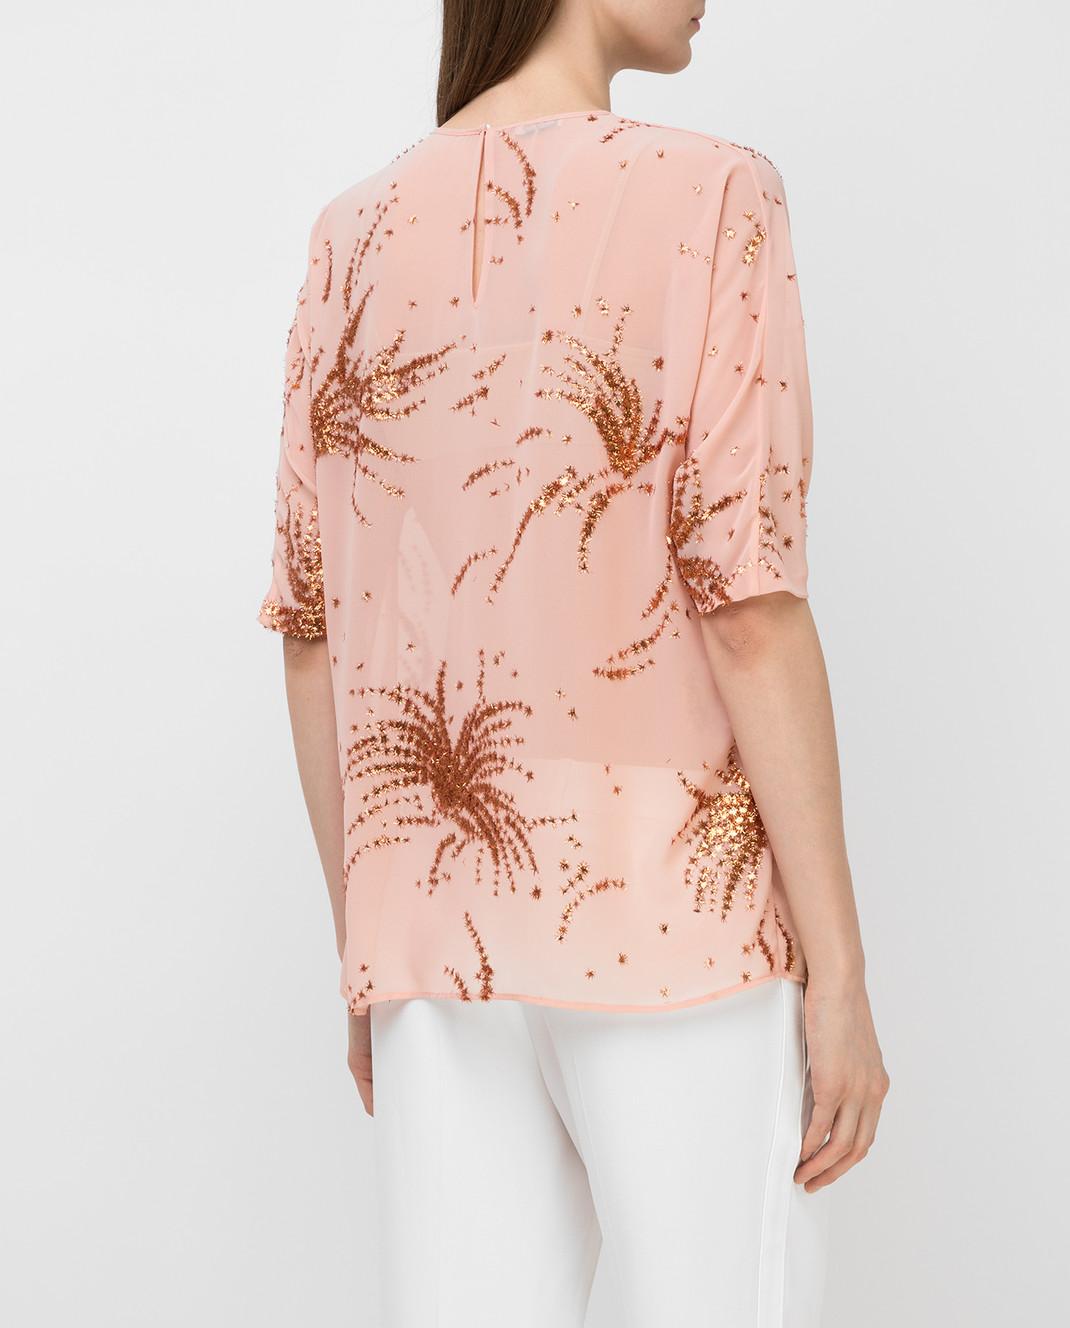 Miu Miu Пудровая блуза MT1296 изображение 4